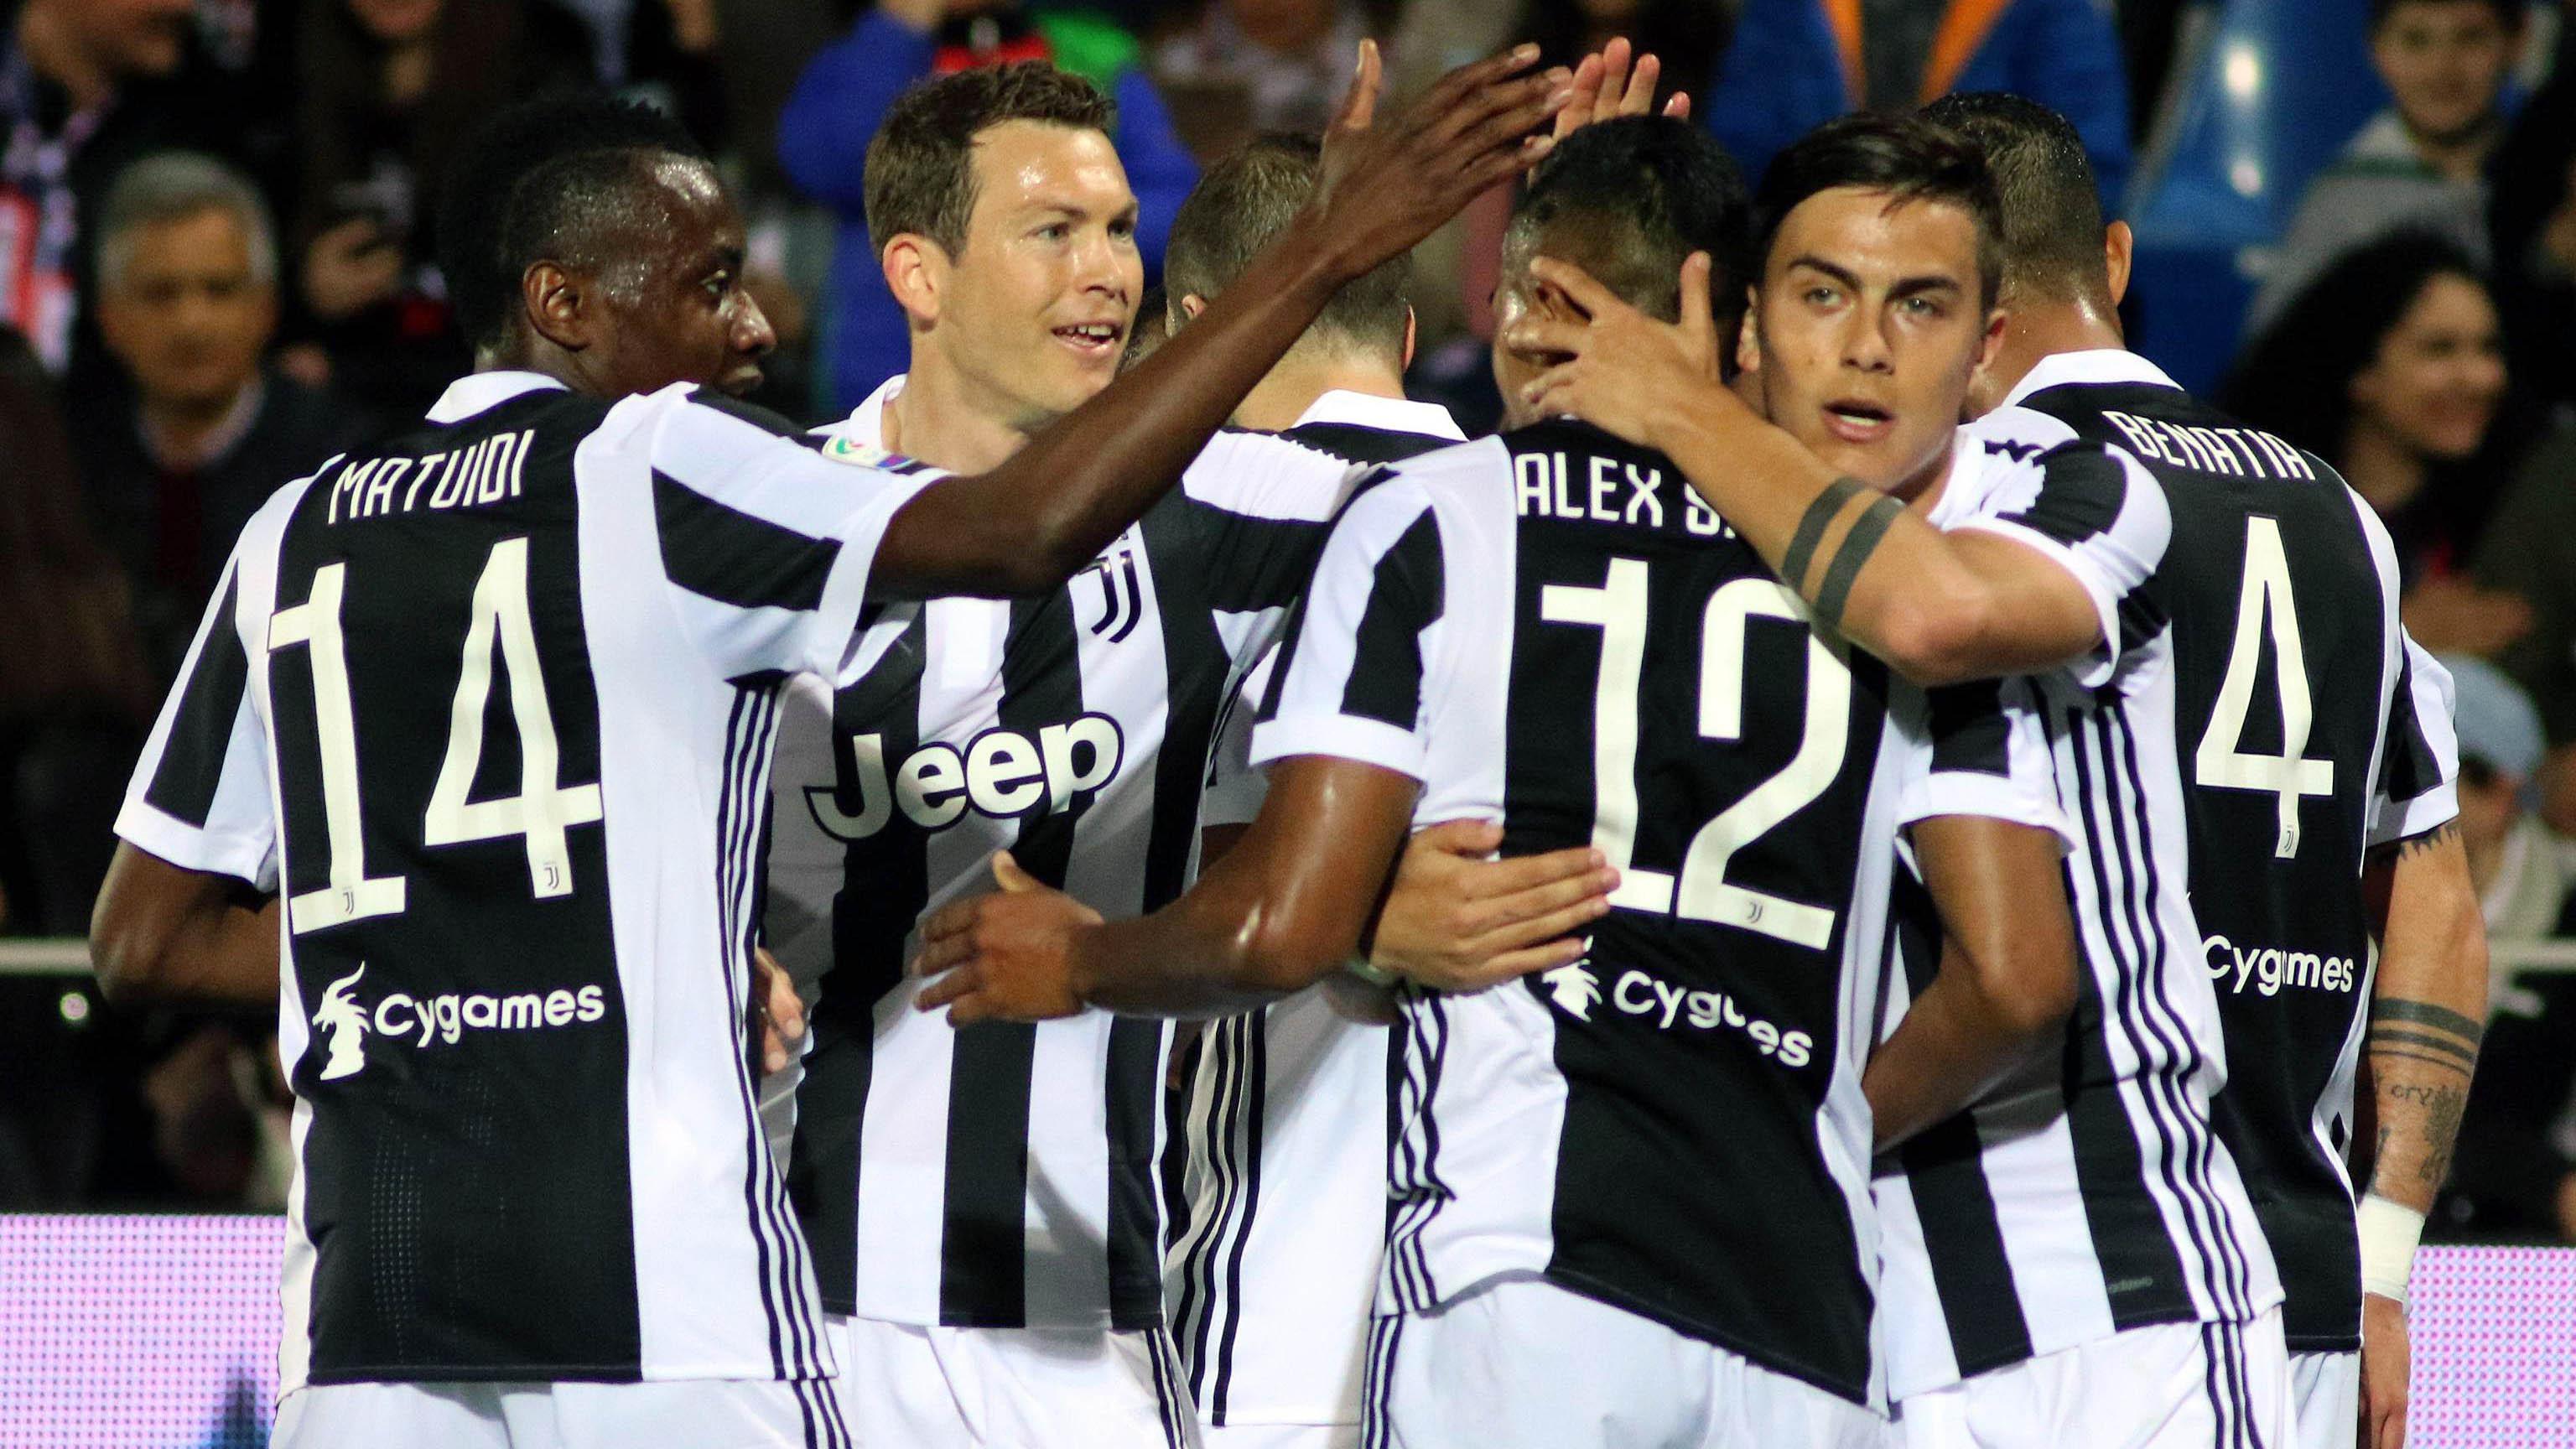 Para pemain Juventus merayakan gol yang dicetak oleh Alex Sandro ke gawang Crotone pada laga Serie A di Stadion Ezio Scida, Kamis (19/4/2018). Juventus ditahan imbang 1-1 oleh Crotone. (AP/Albano Angilletta)